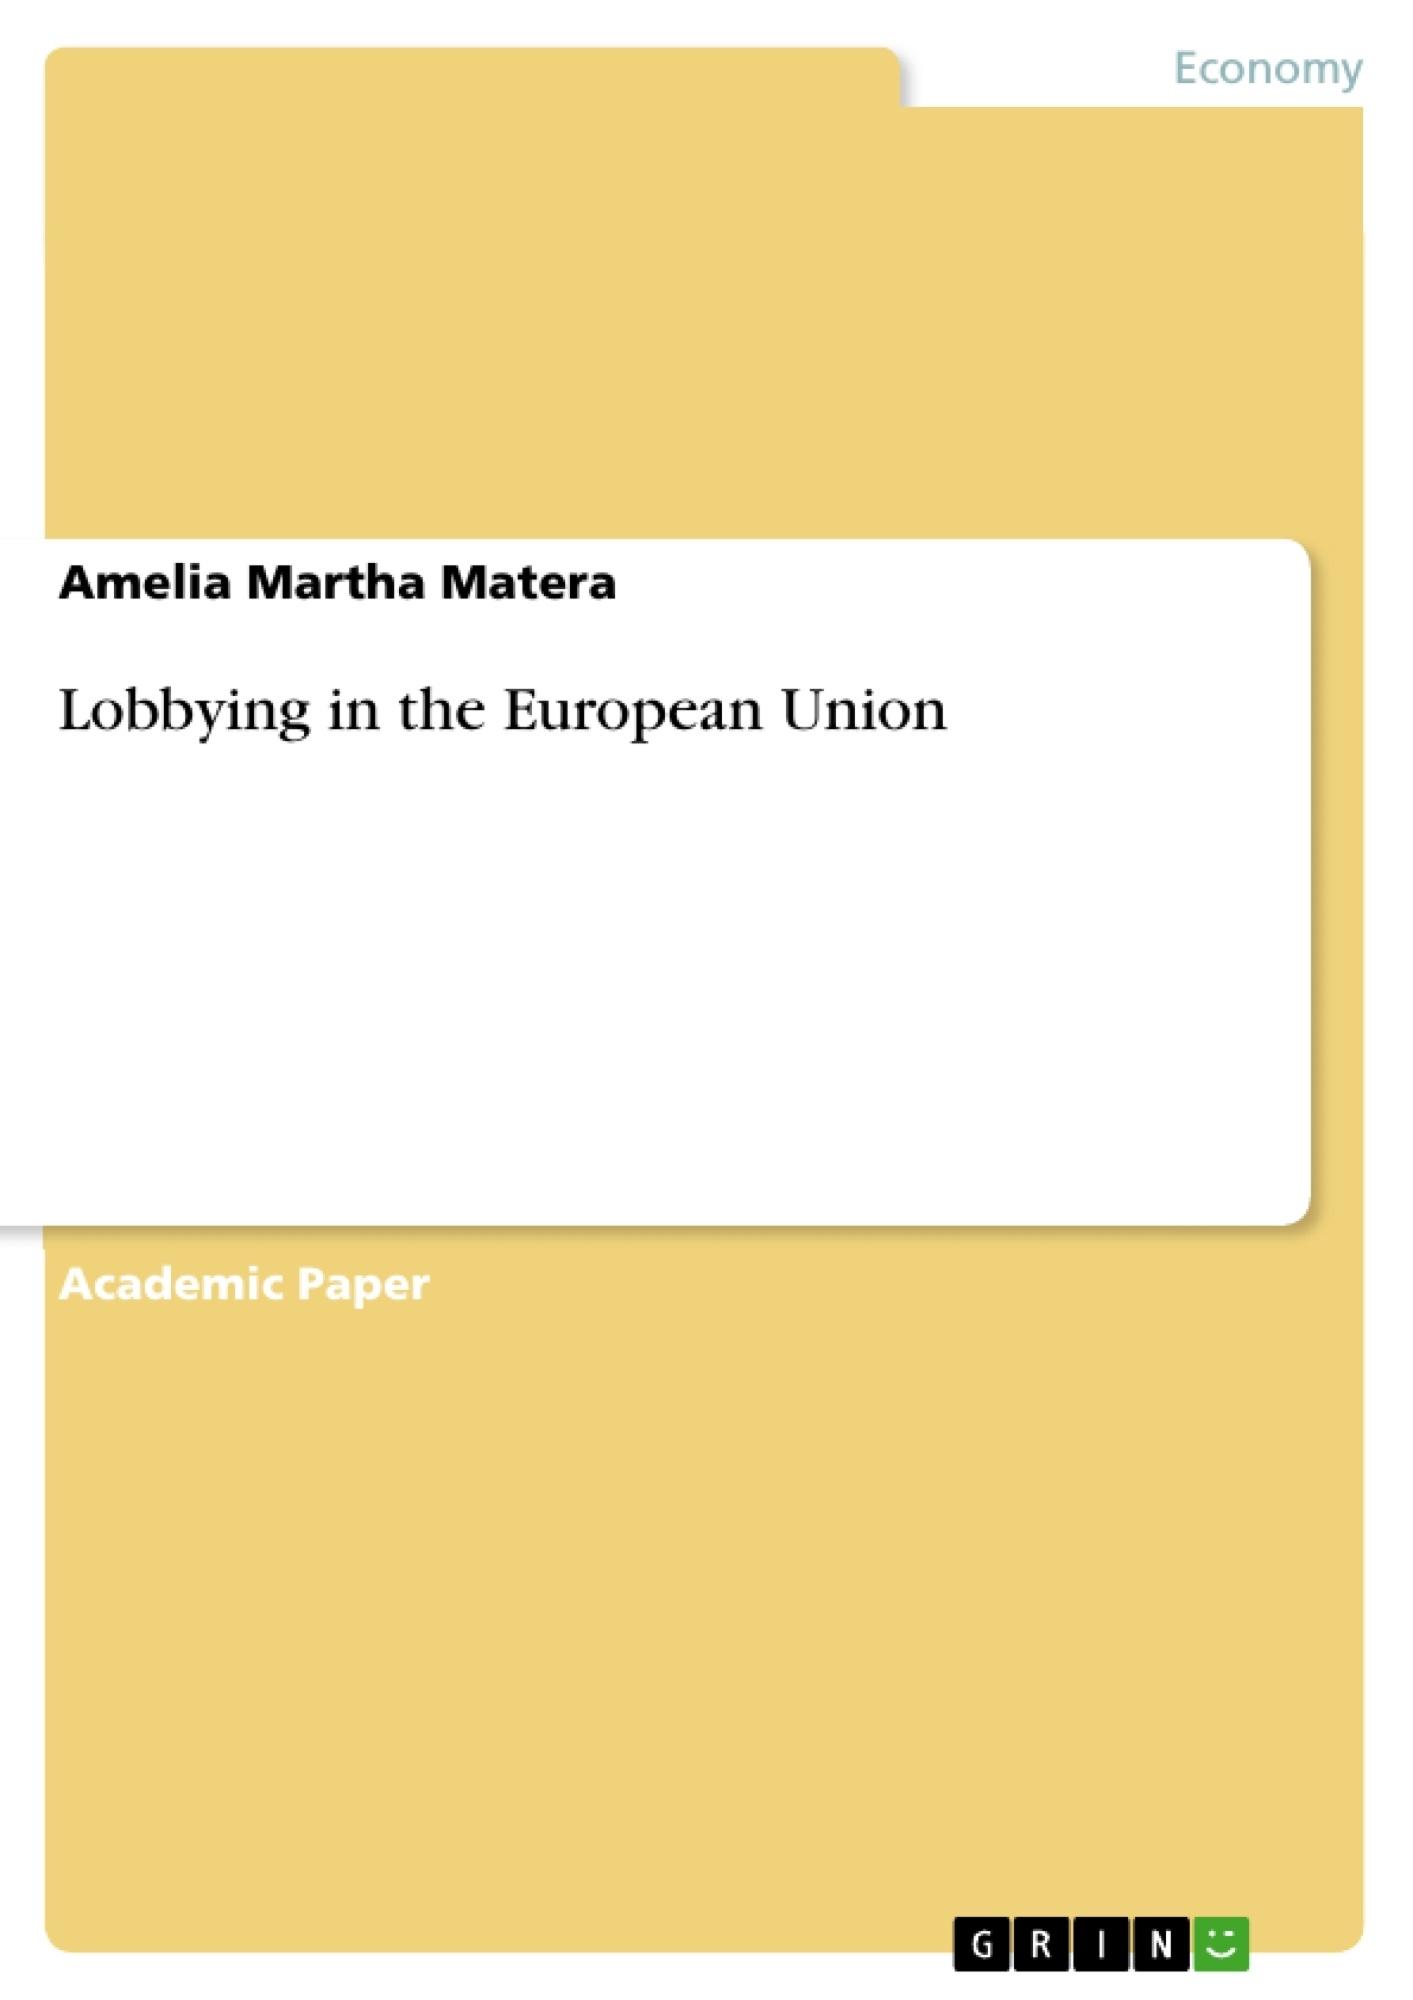 Title: Lobbying in the European Union